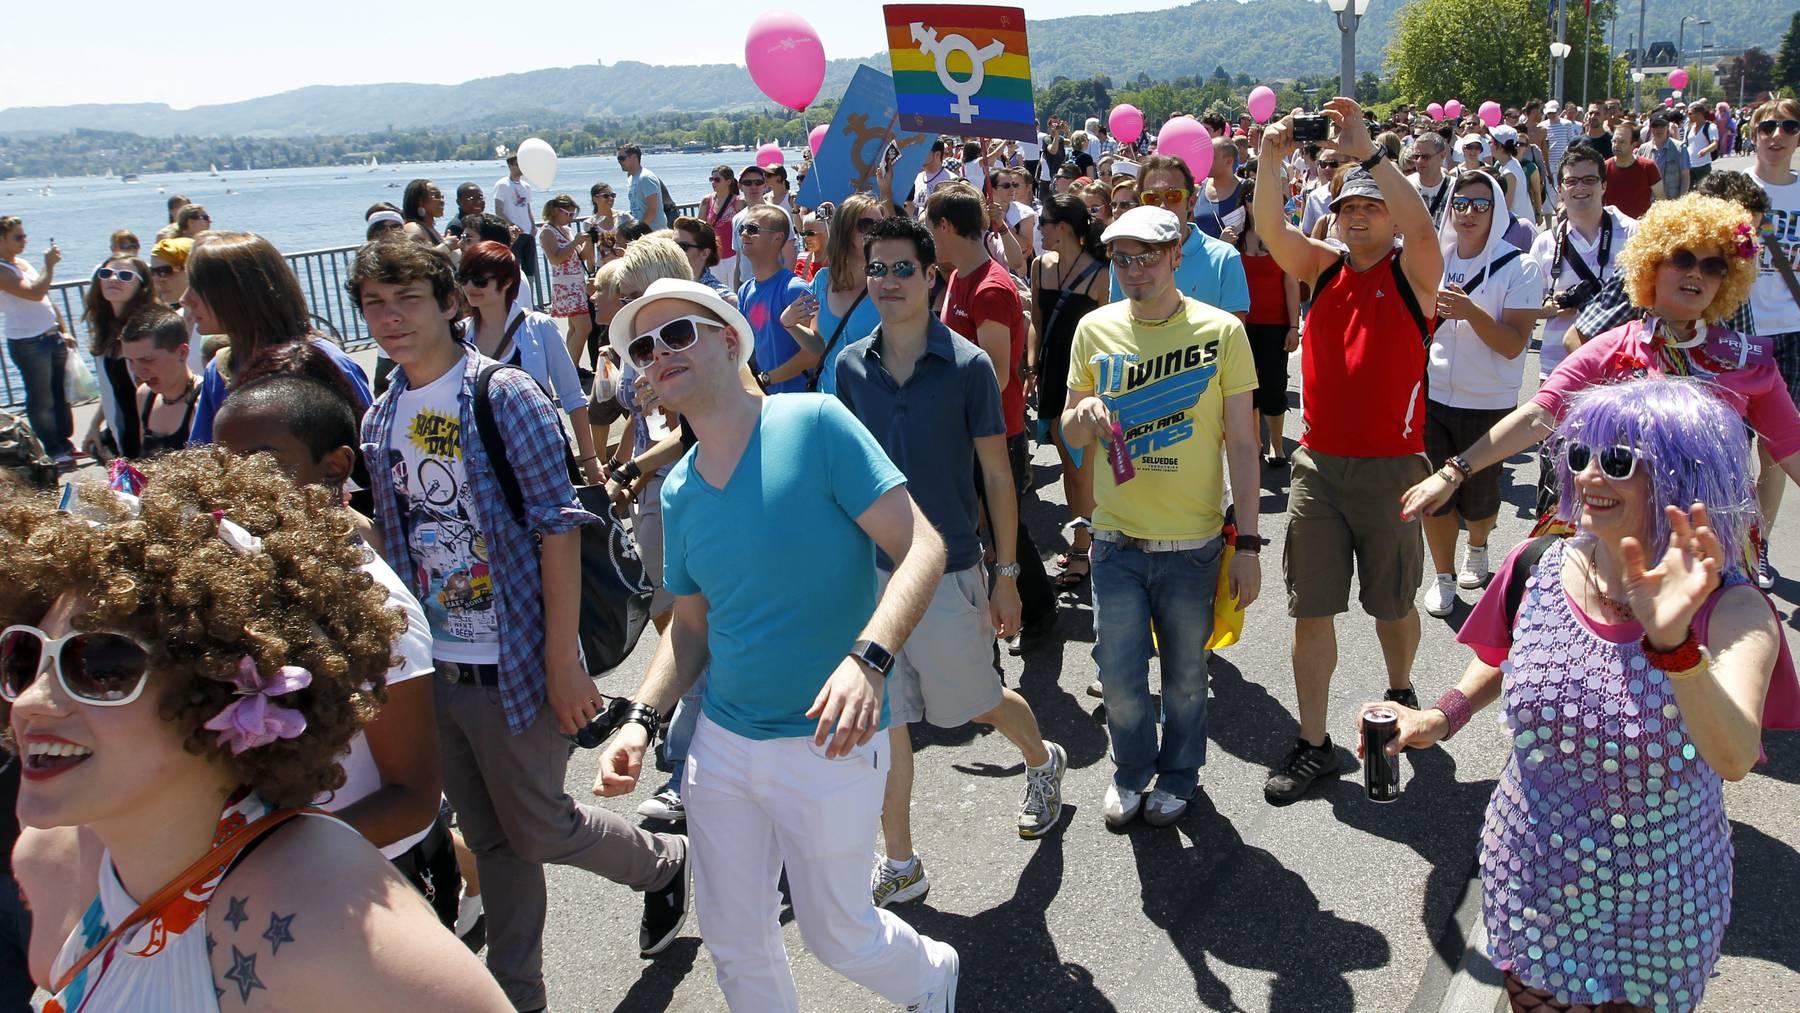 Pride Festival Zürich 2010